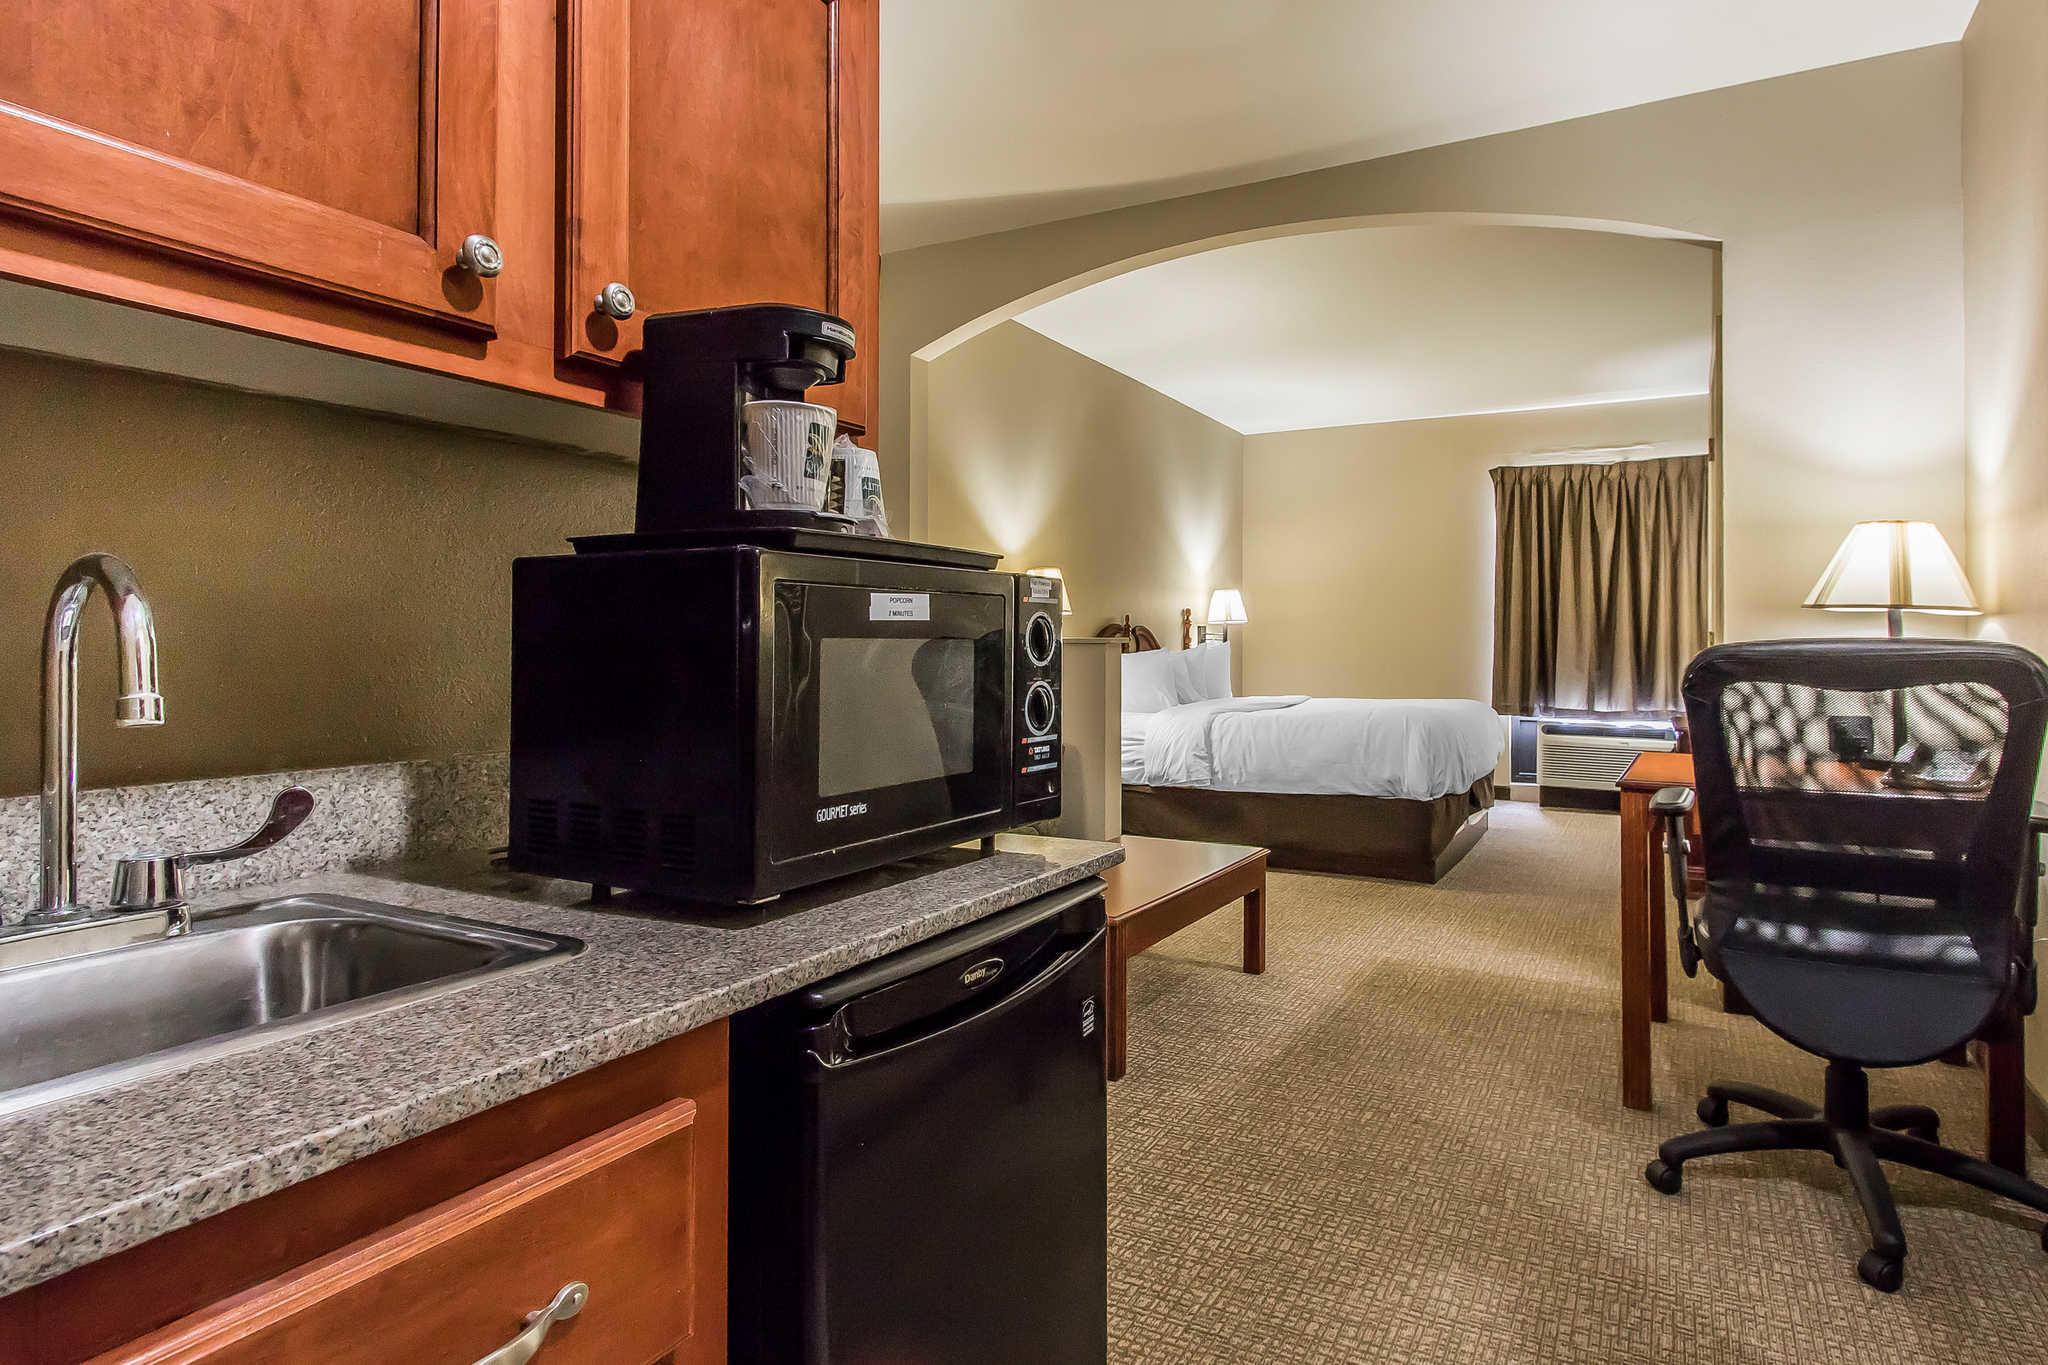 Quality Suites image 6